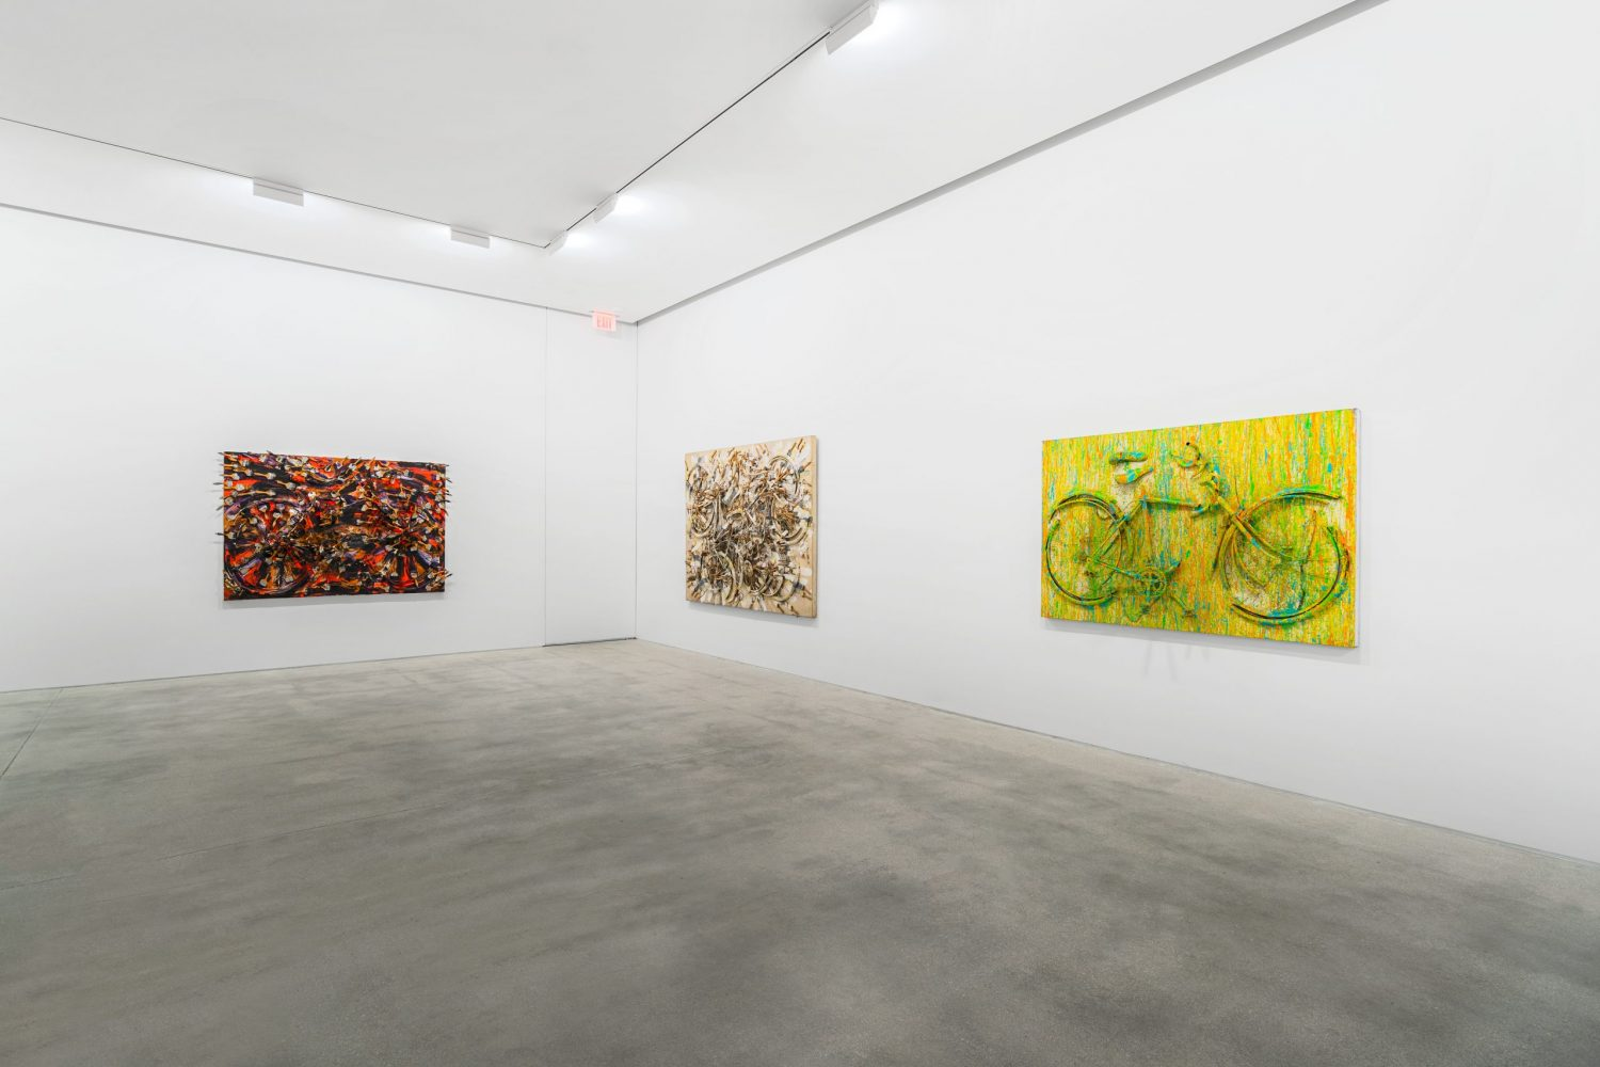 Main Gallery. 4